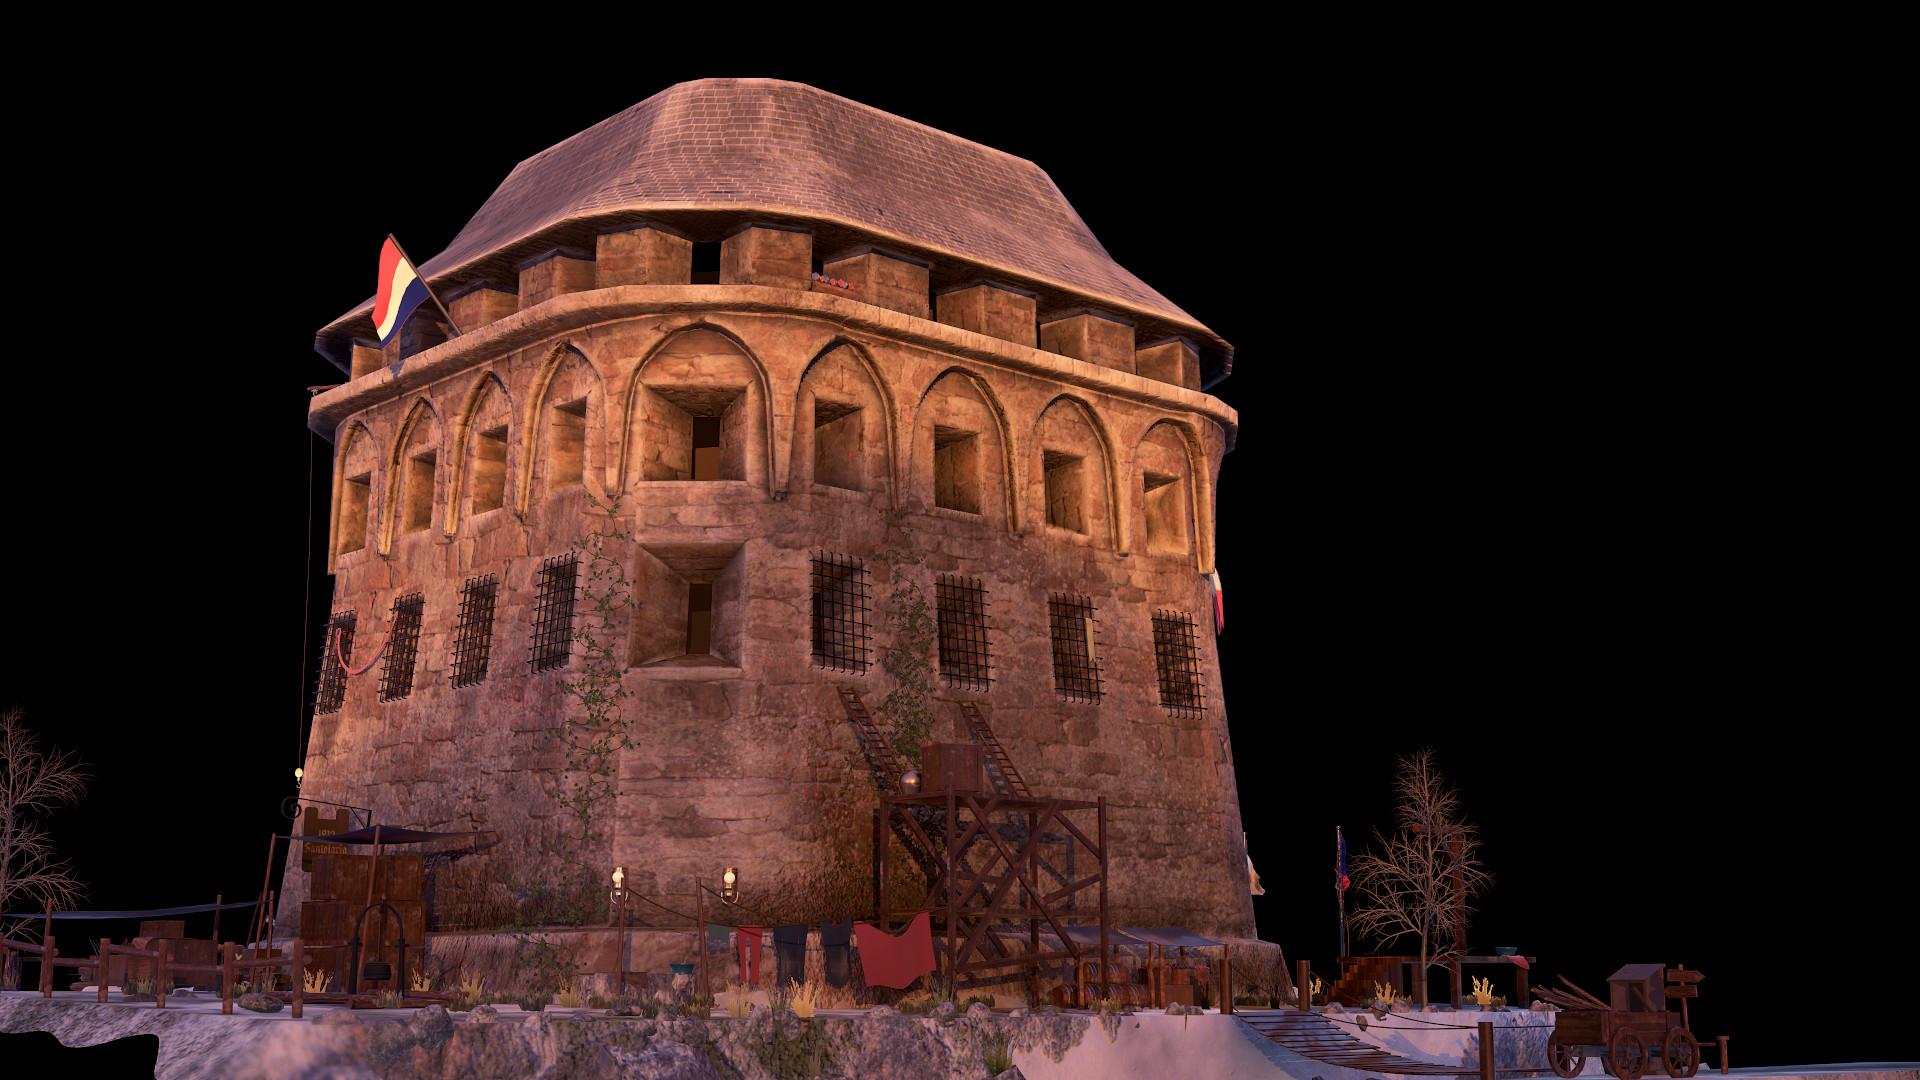 Dani palacio santolaria screenshot018